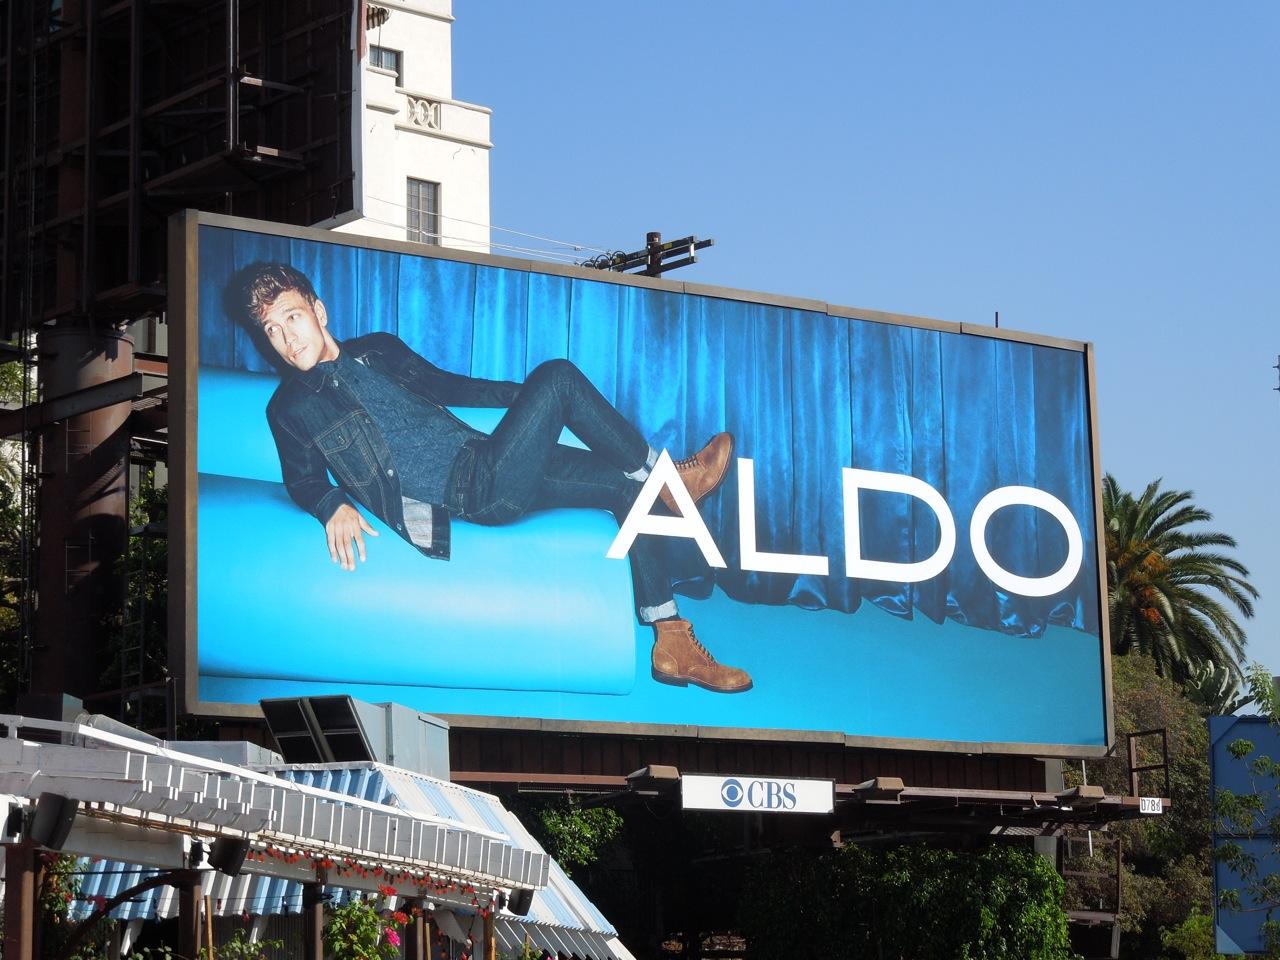 Daily Billboard Aldo Shoes 40 Years Billboards